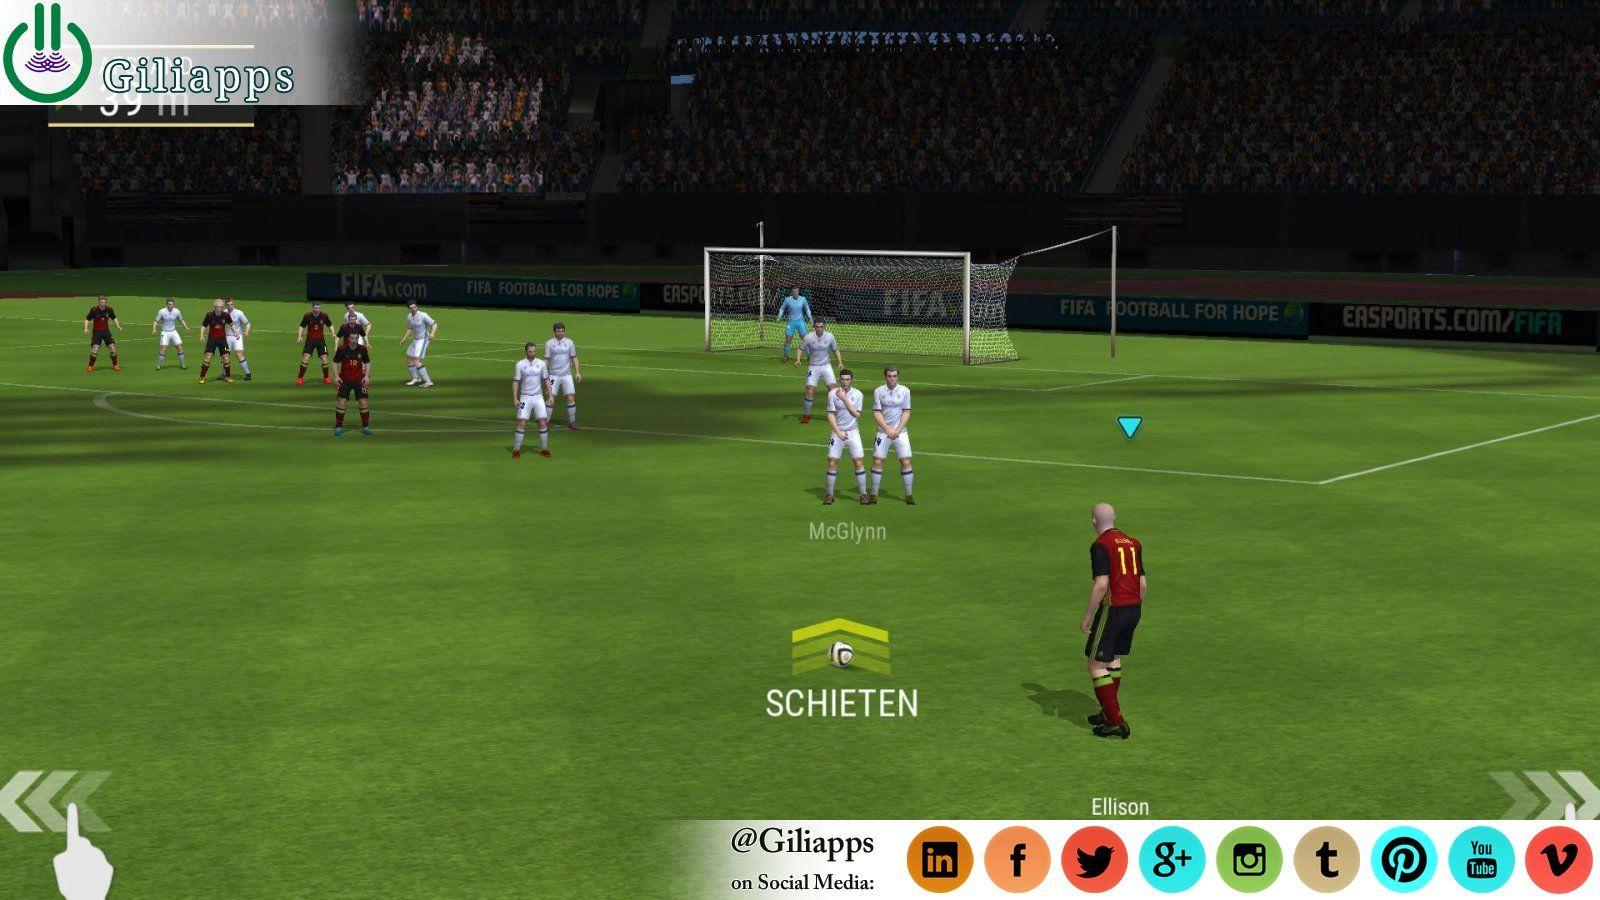 FIFA Soccer for mobile Fifa, Video game news, Mobile